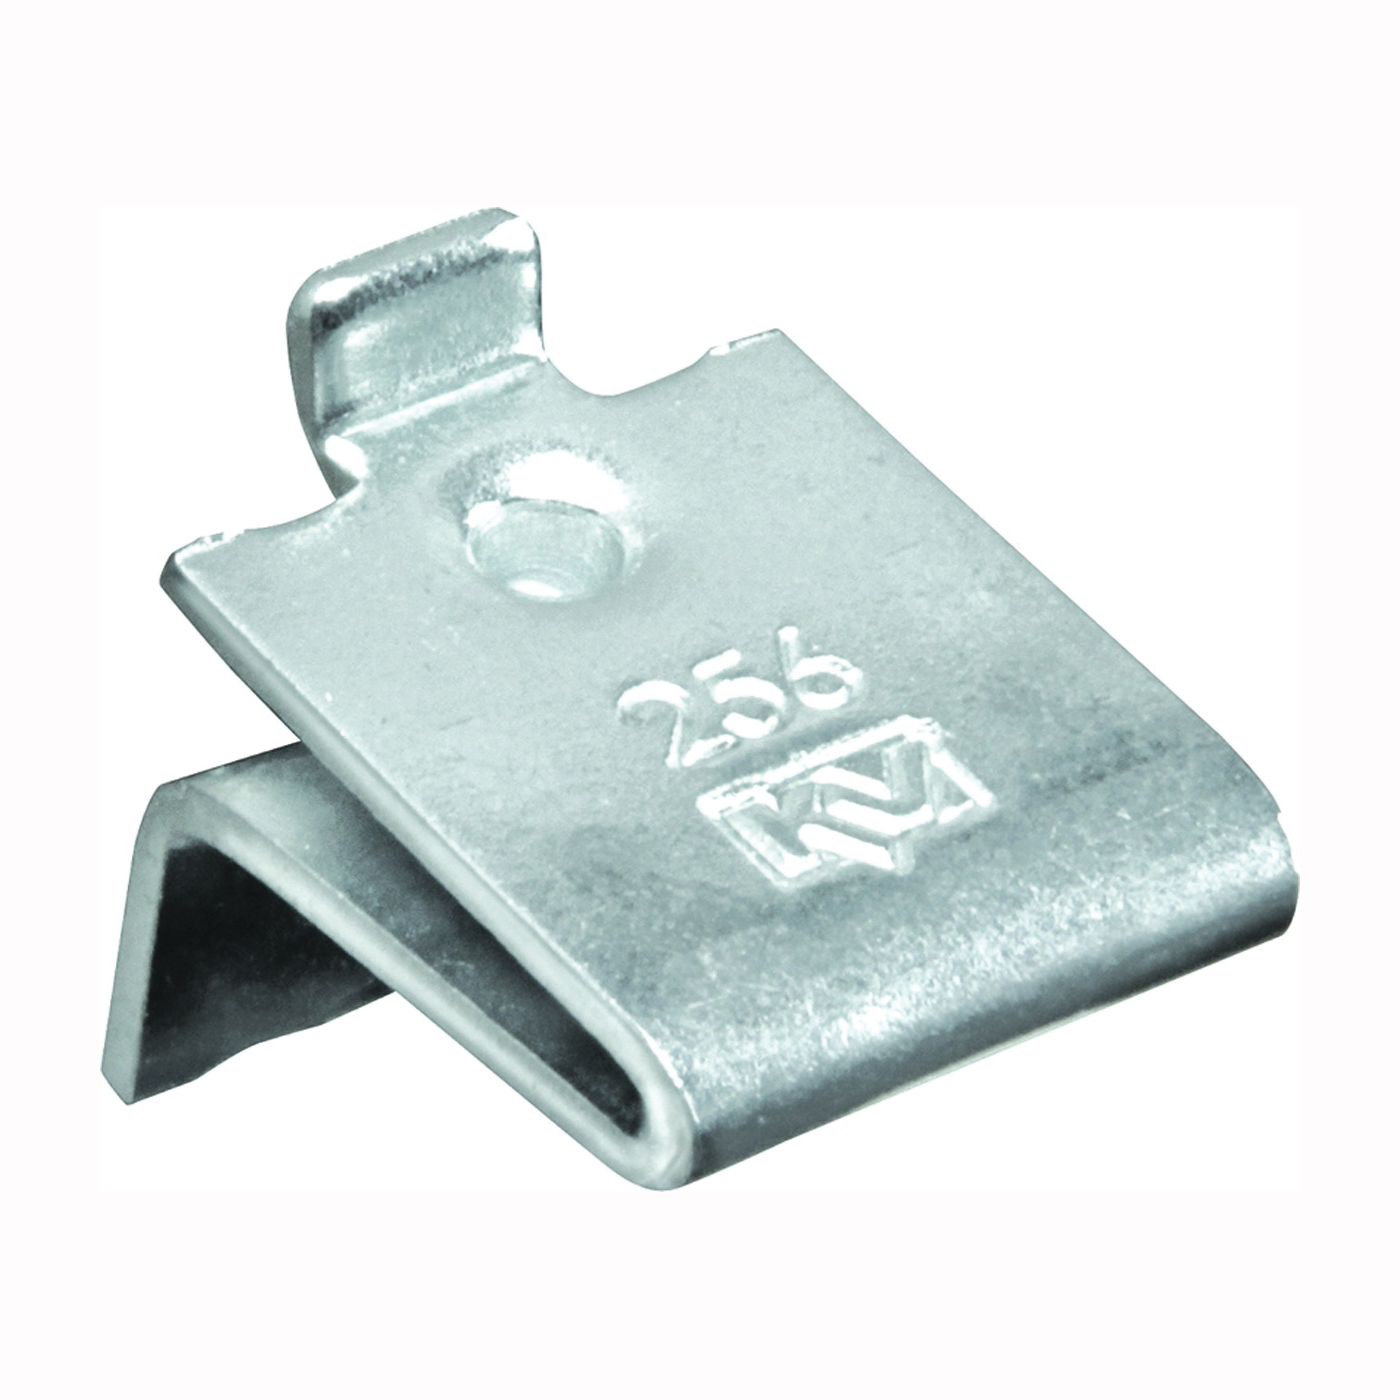 Picture of Knape & Vogt 256P ZC Pilaster Shelf Support Clip, Adjustable, Steel, 40, Mortise Mounting